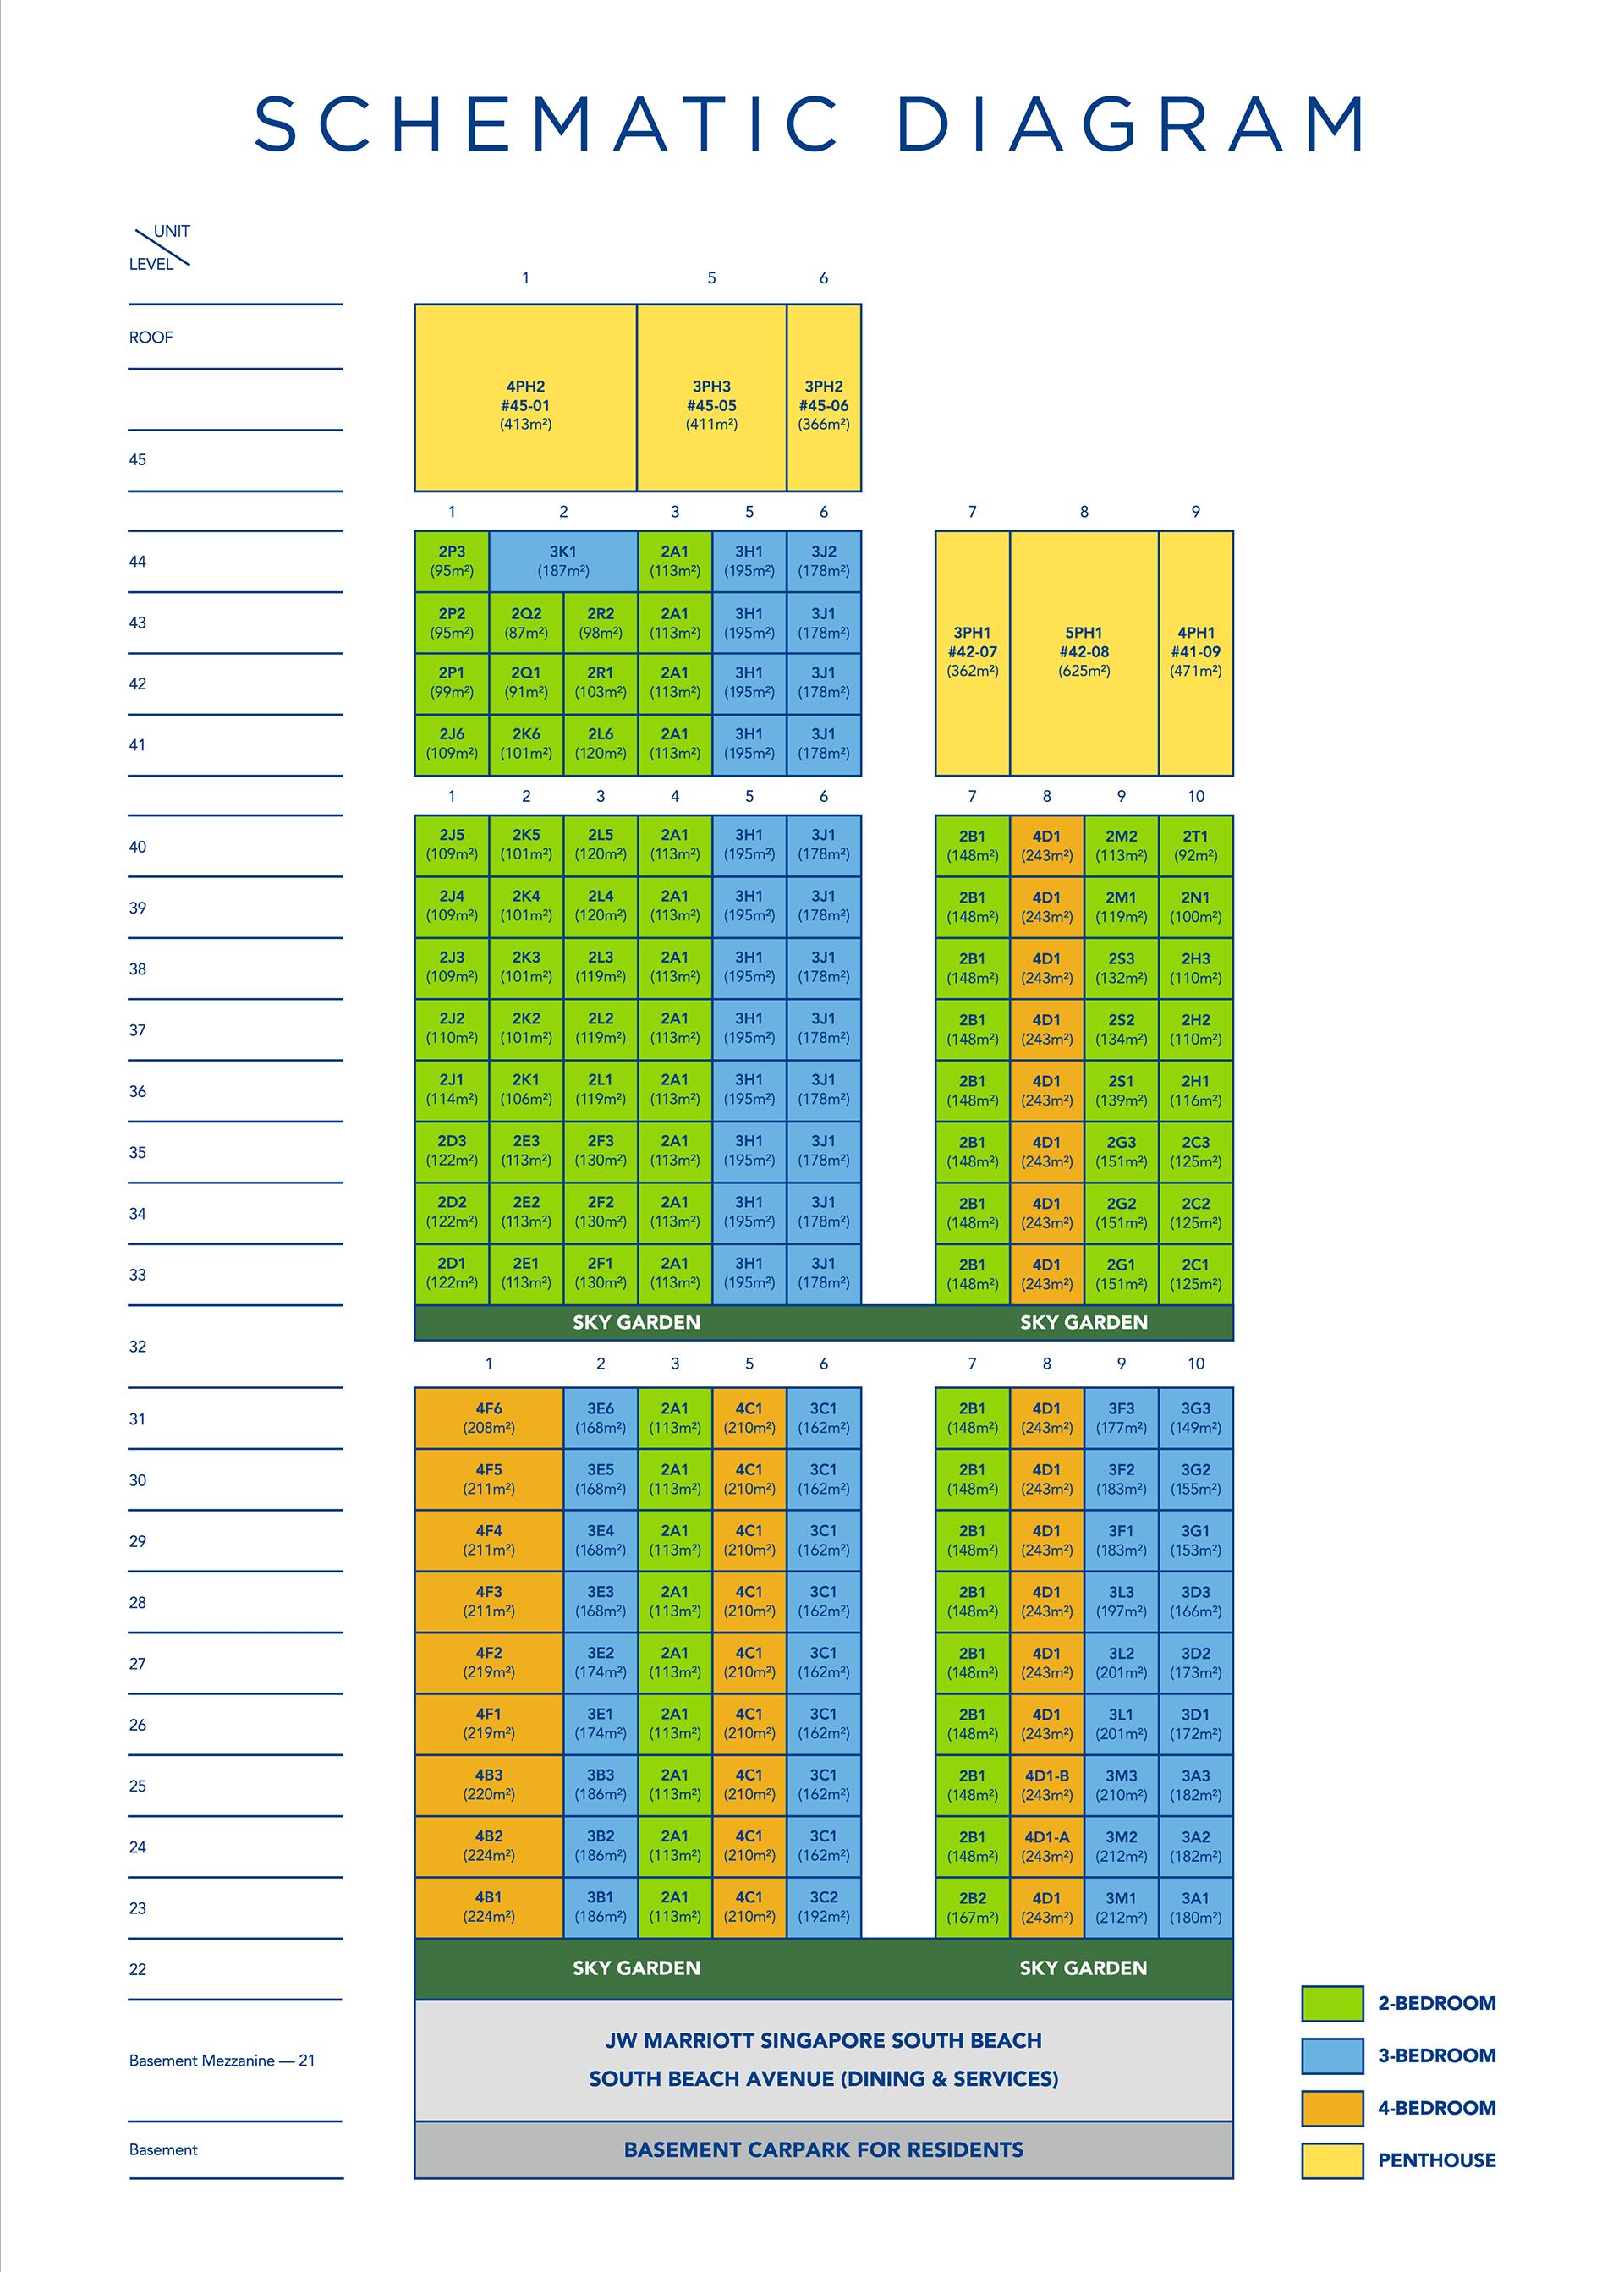 South Beach Residences Diagrammatic Chart